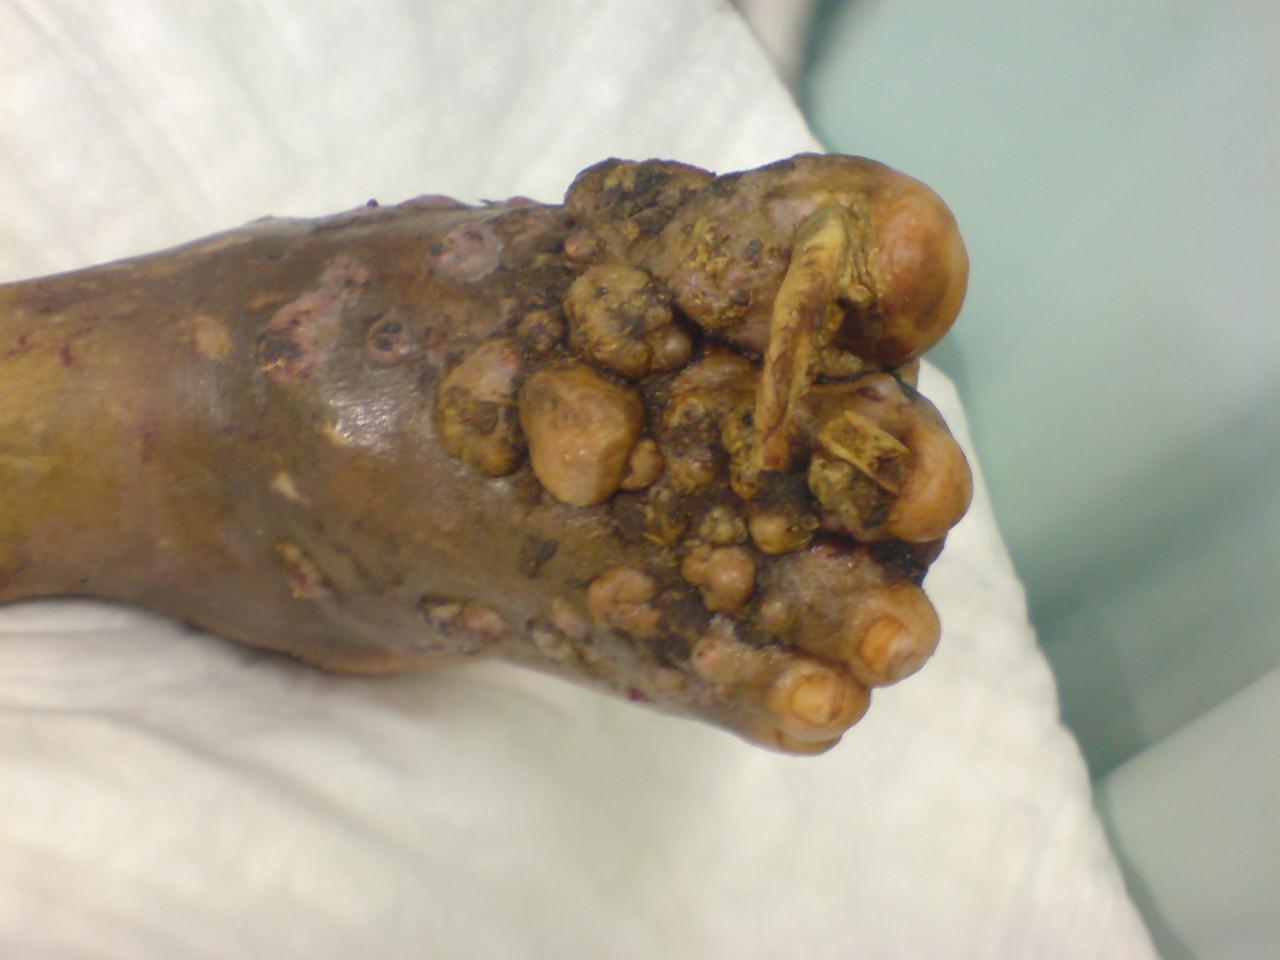 Severe Athlete's Foot